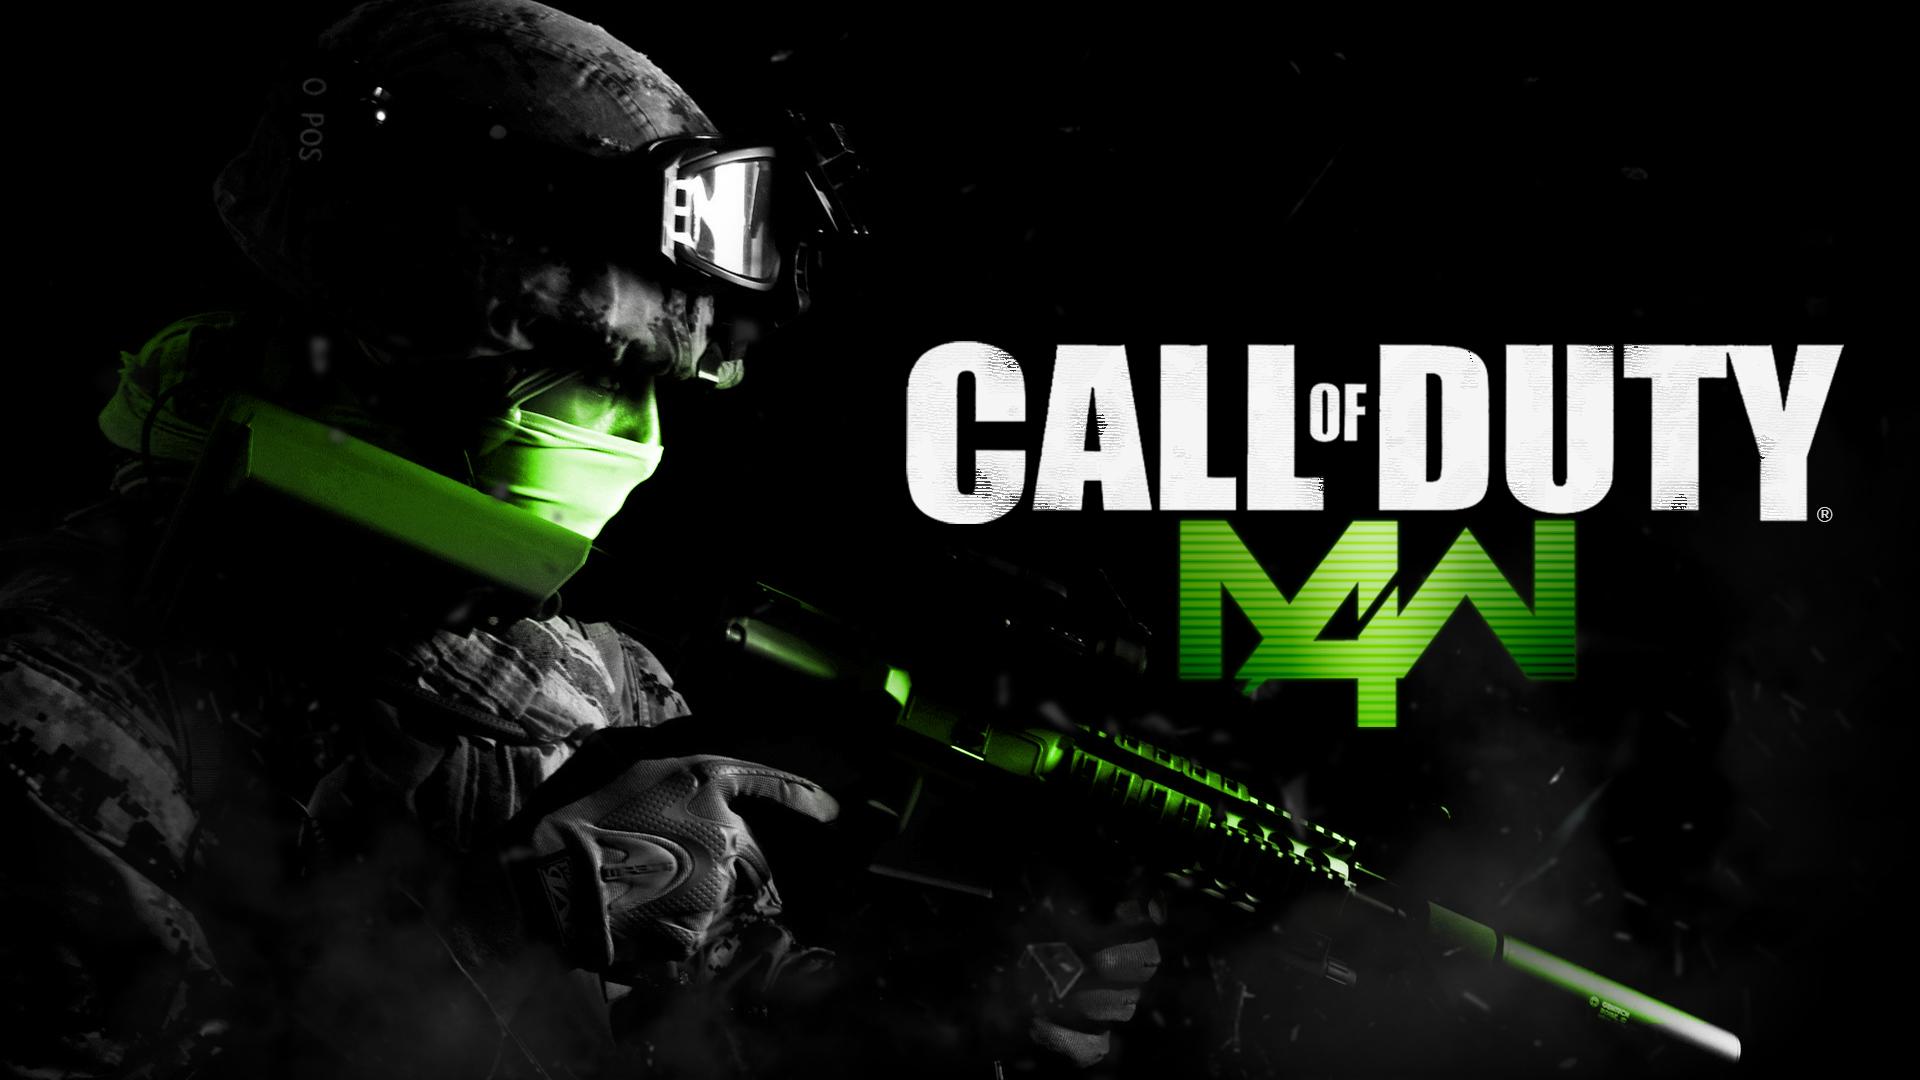 call of duty modern warfare 4 game HDjpg 1920x1080